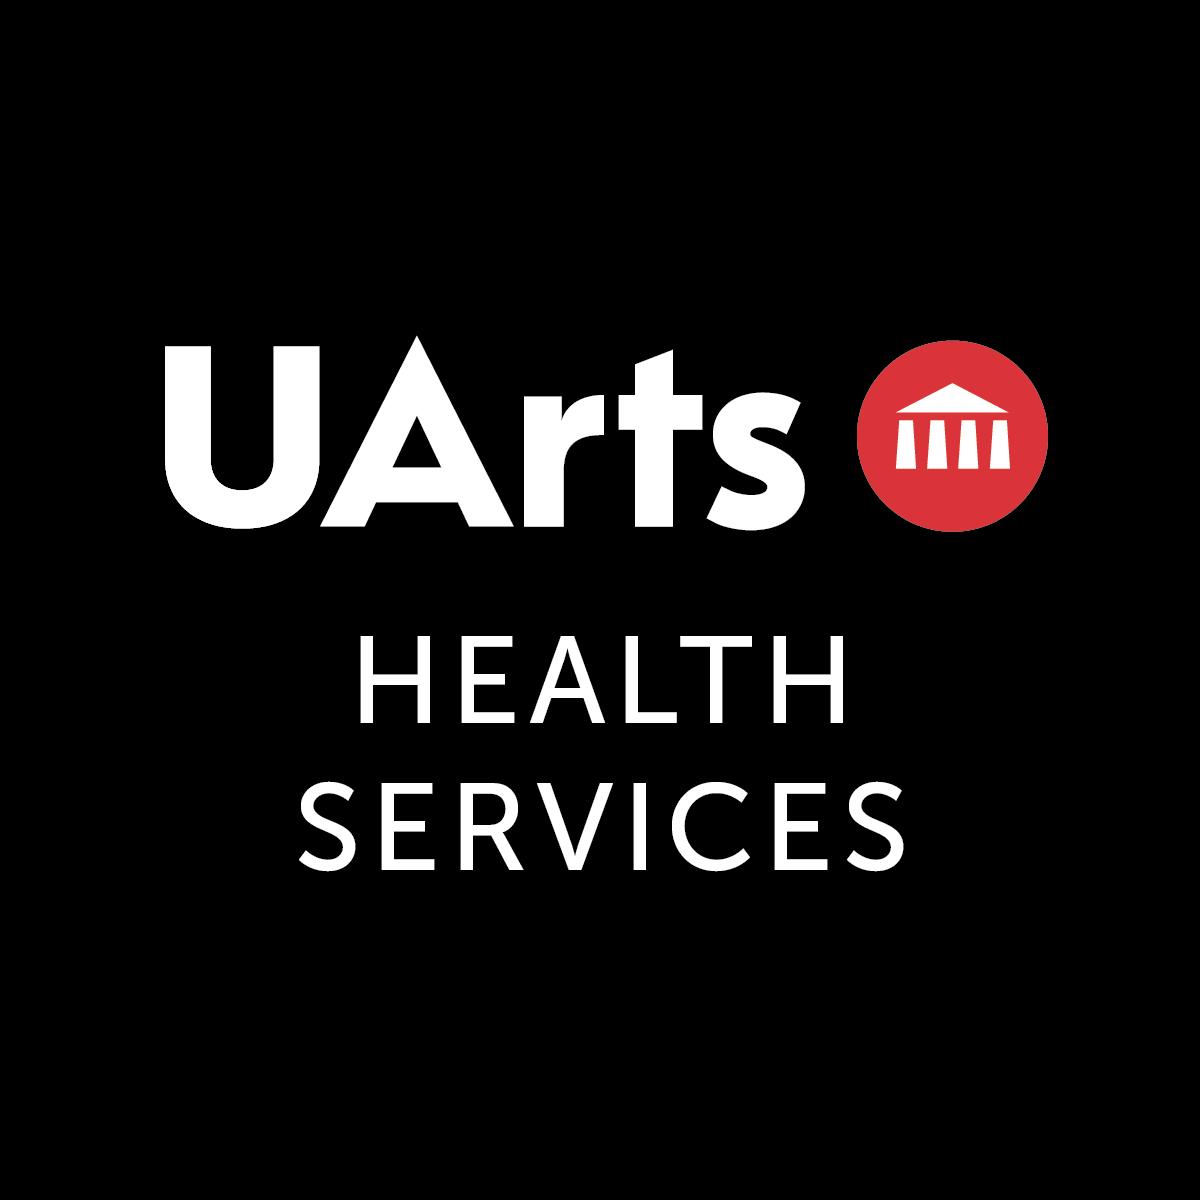 UArts Health Services